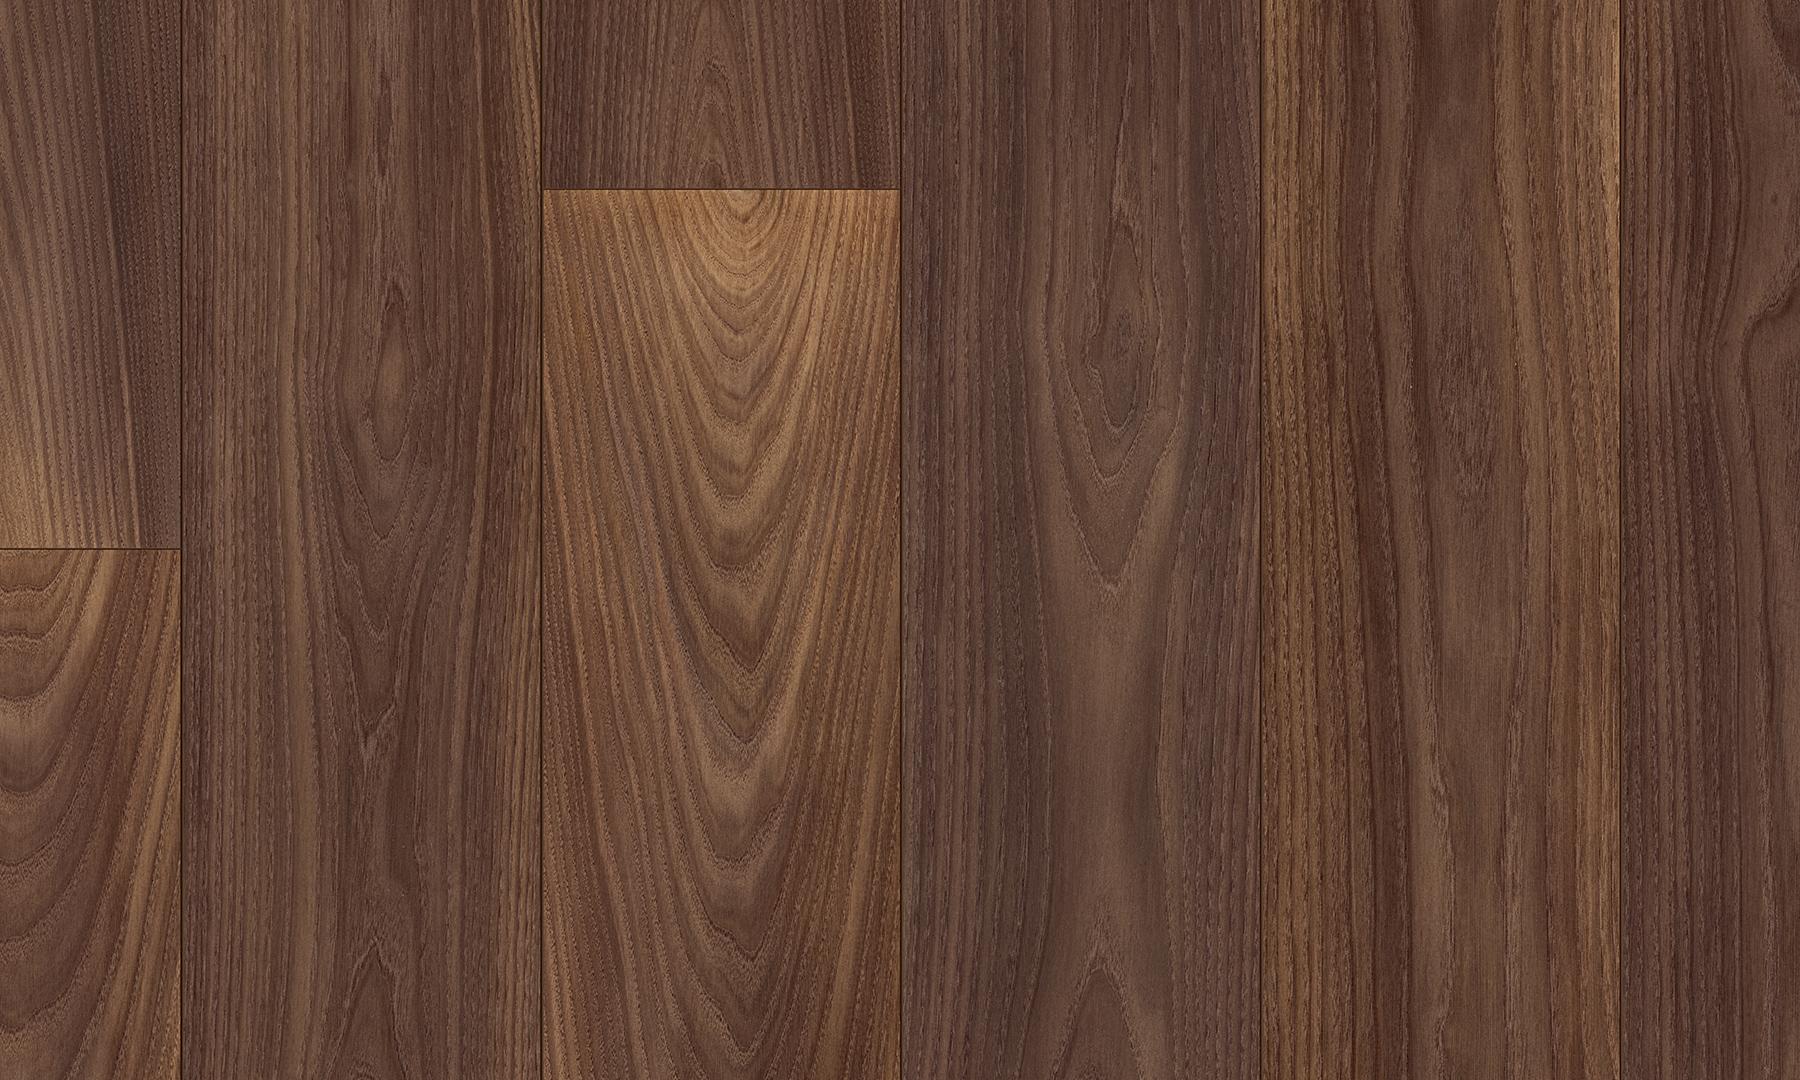 Pergo Commercial Laminate Flooring Alpine Walnut Plank